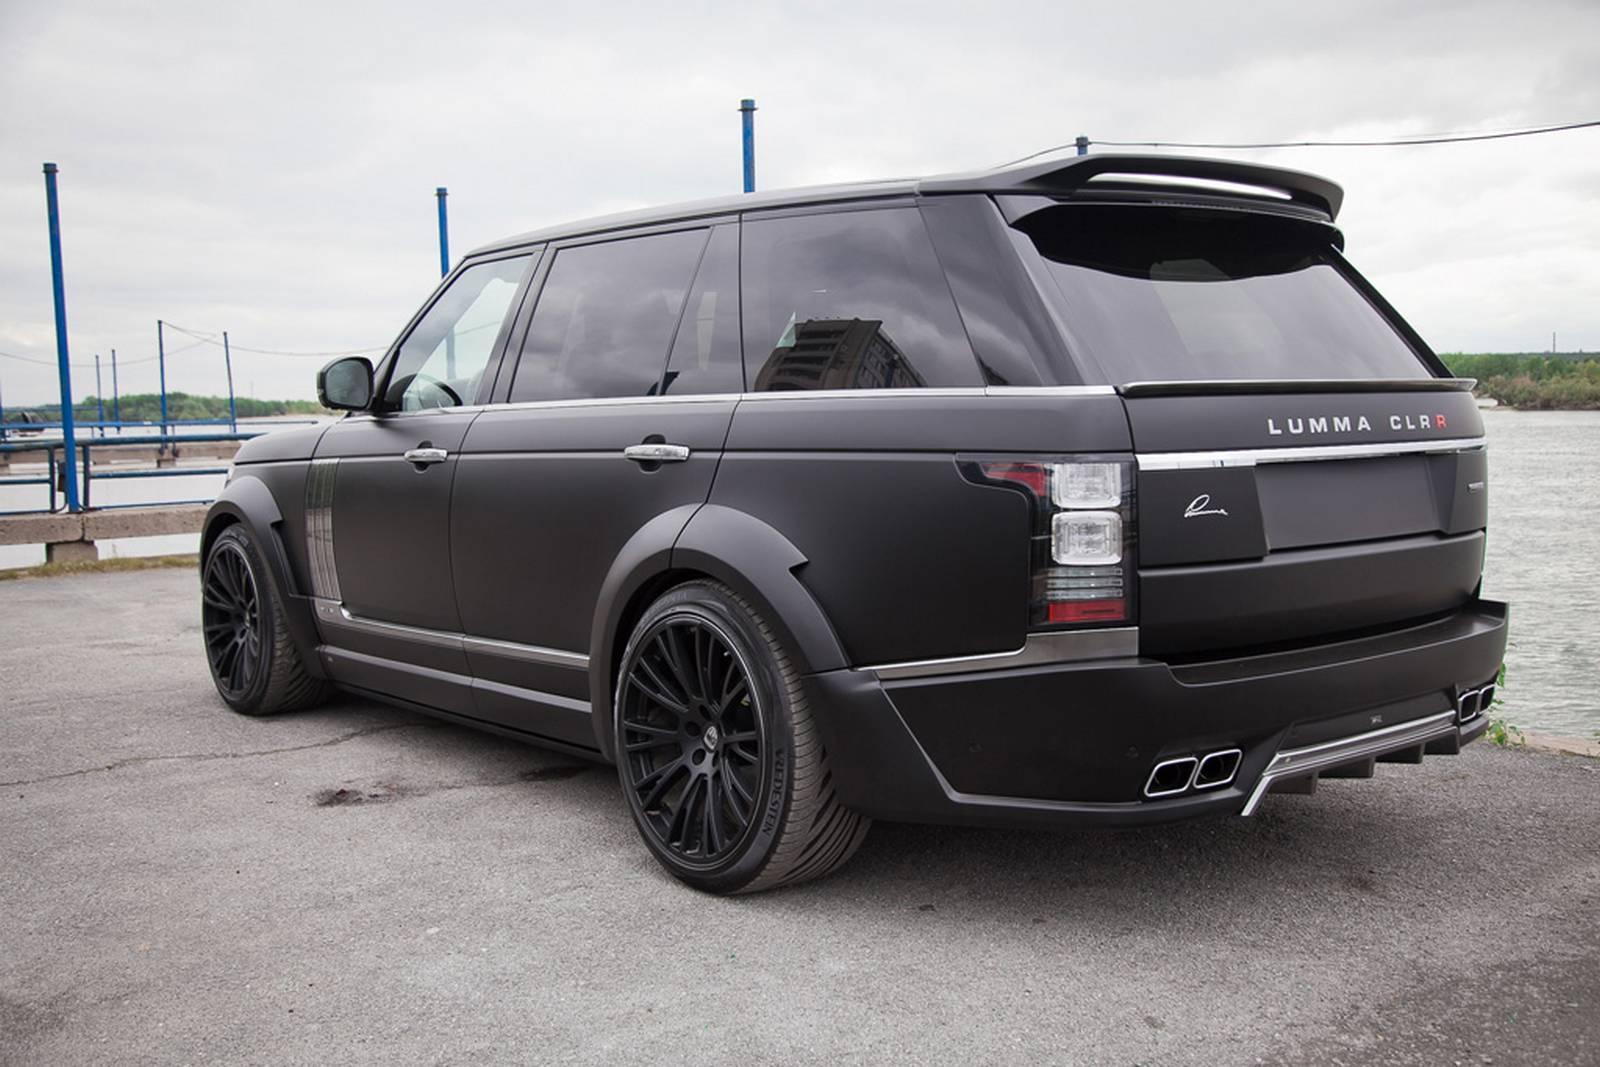 Official Lumma Clr R Range Rover Lwb Gtspirit